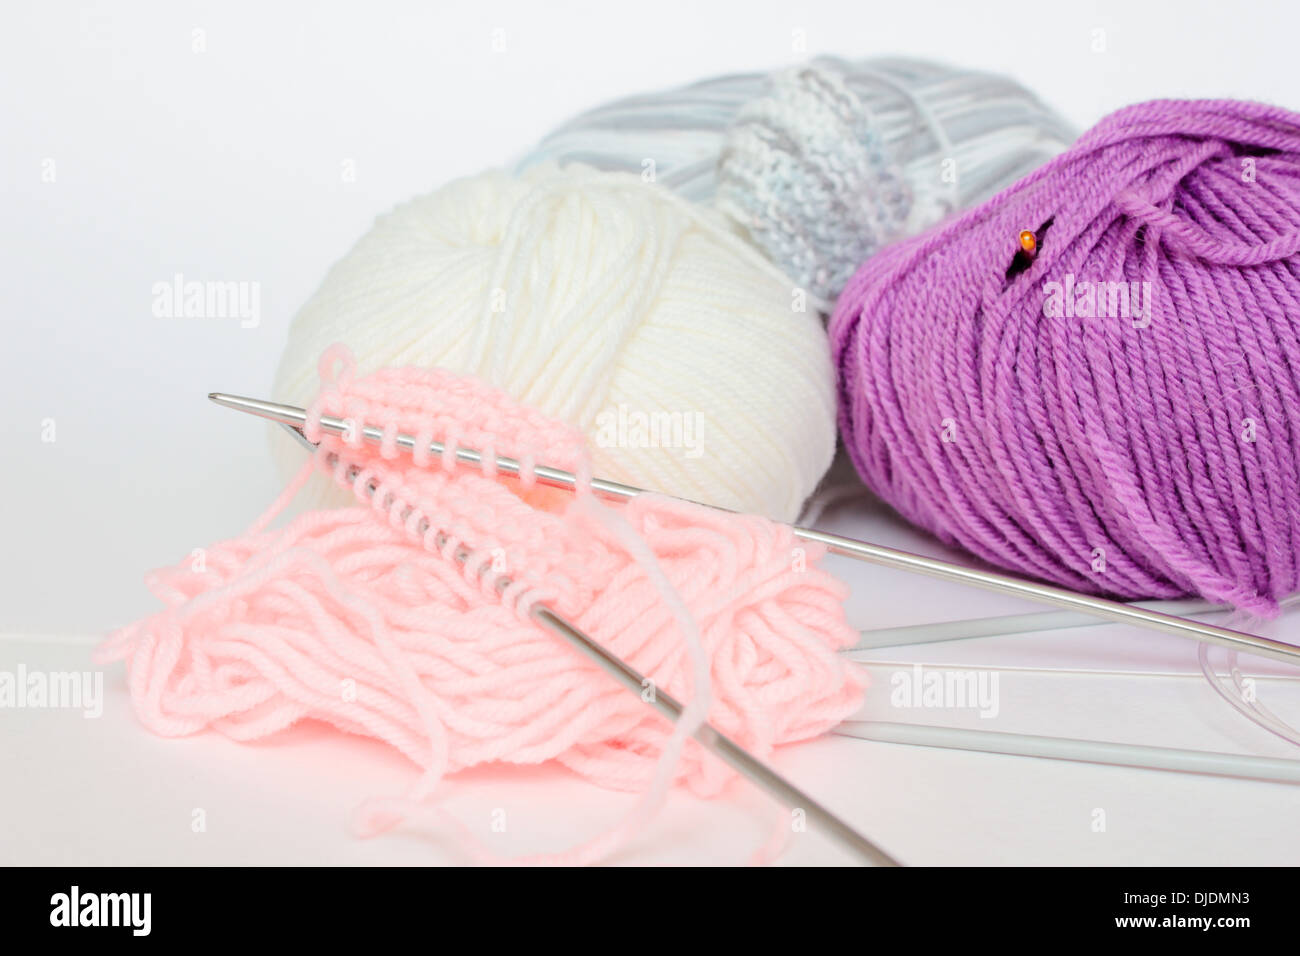 knitting 'knitting needles' yarn skein skeins wool woven purple pink white 'whote background' nobody - Stock Image